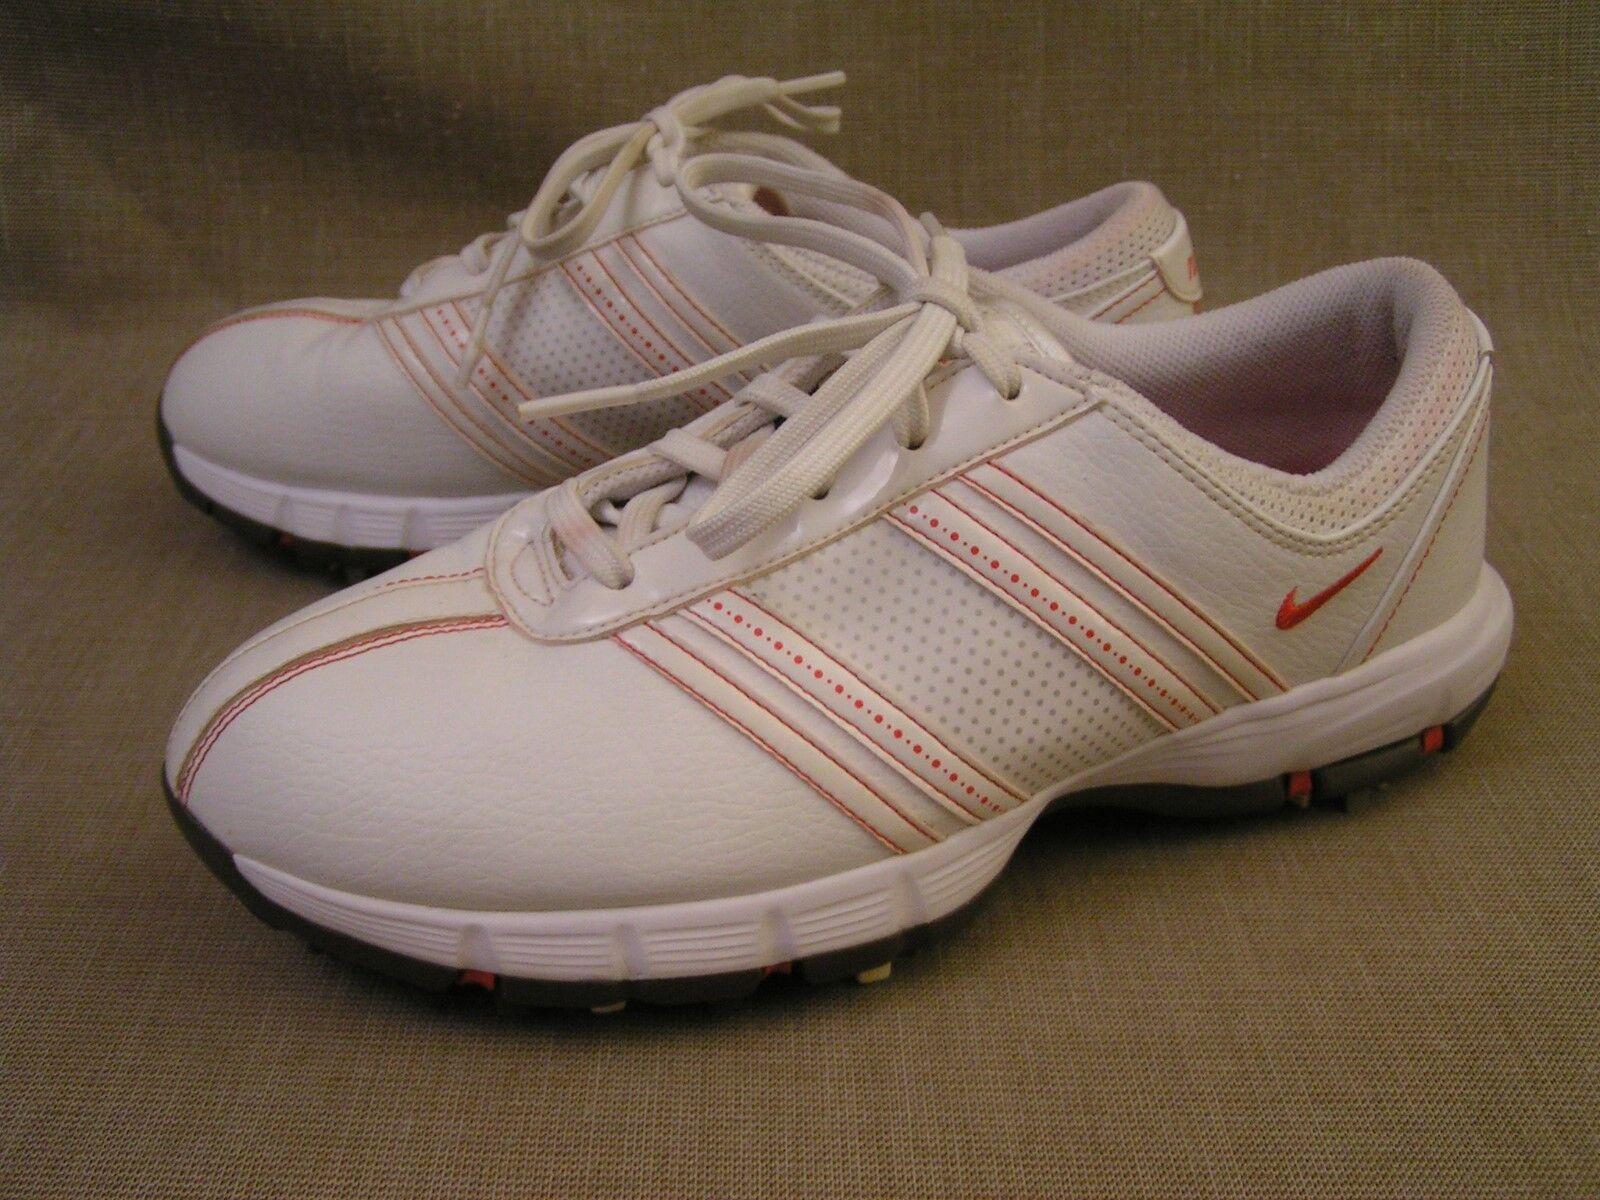 Nike Womens Delight White & Red Golf Cleat Tac Spike Shoes 317622-161 Sz. 8 EUC Seasonal clearance sale